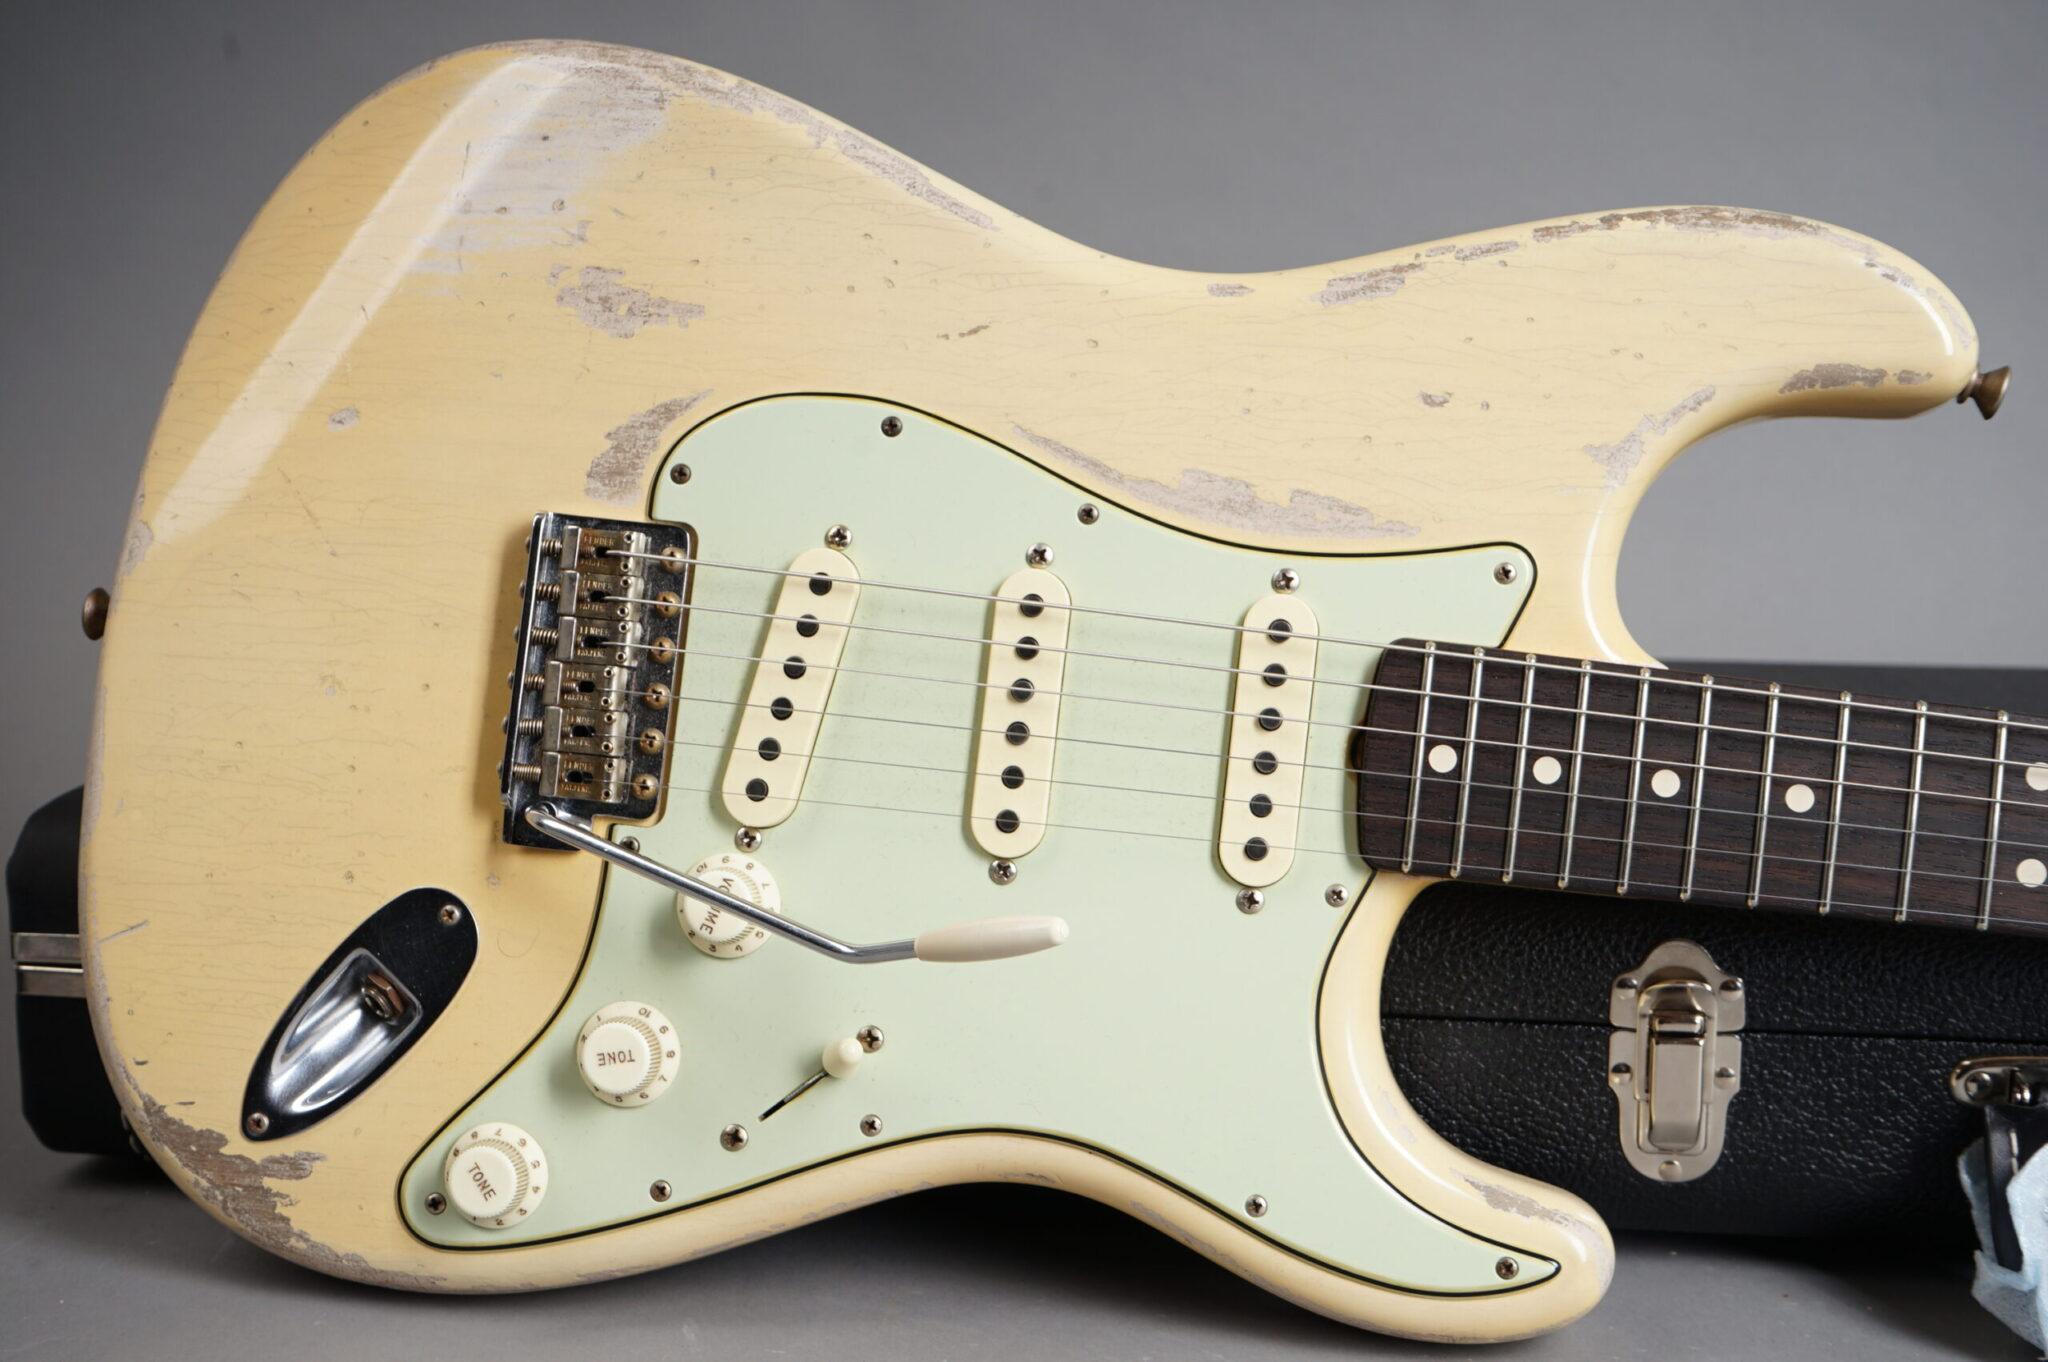 https://guitarpoint.de/app/uploads/products/2020-fender-custom-shop-todd-krause-masterbuilt-1963-stratocaster-heavy-relic-nocaster-blonde/1963-Fender-Todd-Krause-Masterbuilt-1963-Stratocaster-NBL-R102156-9-scaled-2048x1362.jpg